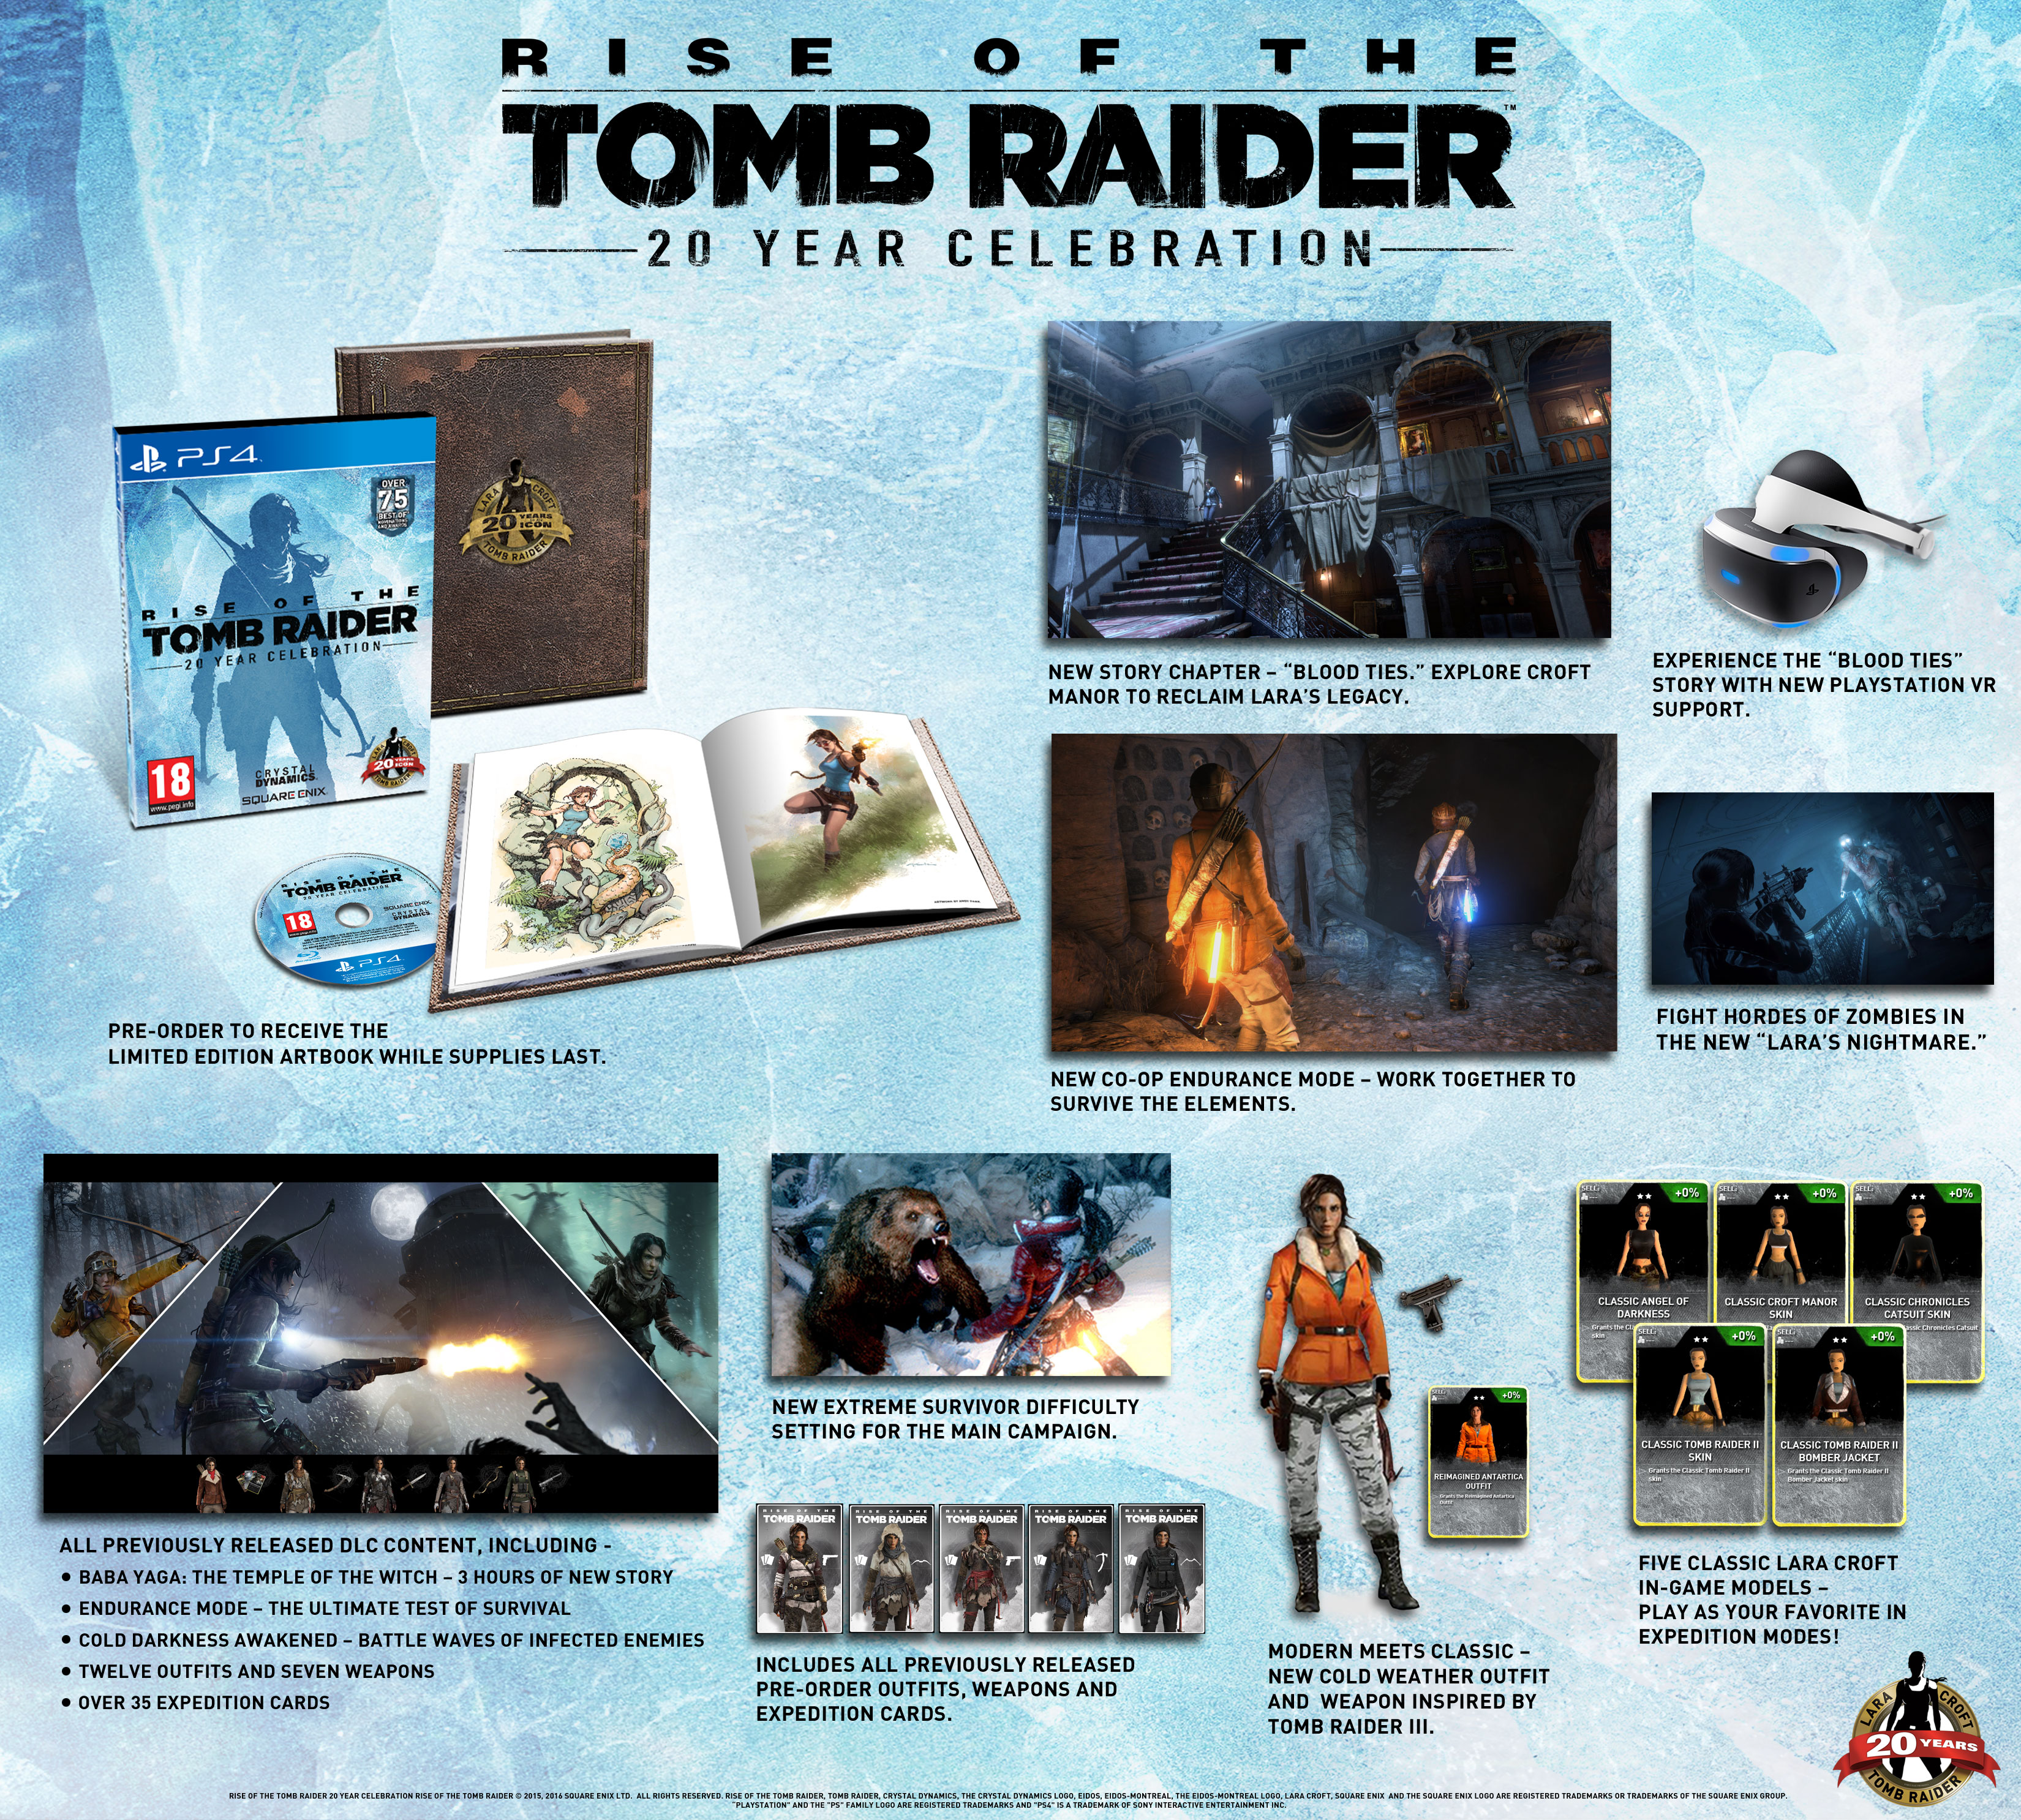 Rise of the Tomb Raider 20 Year Celebration – 1